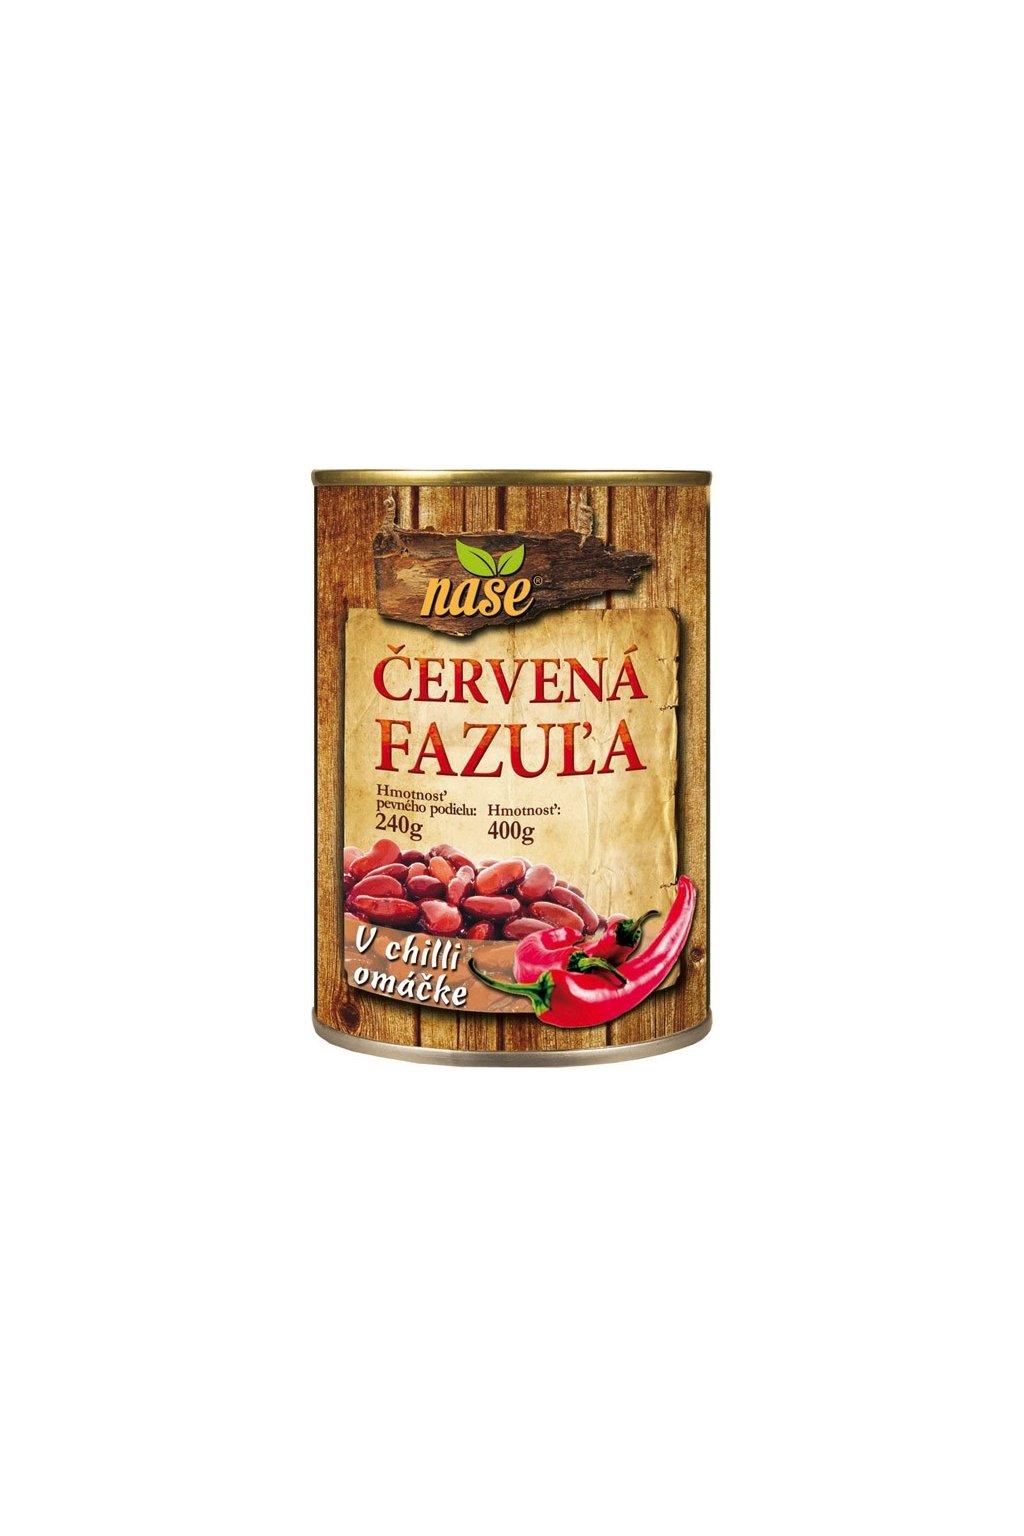 nase cervena fazula chilli